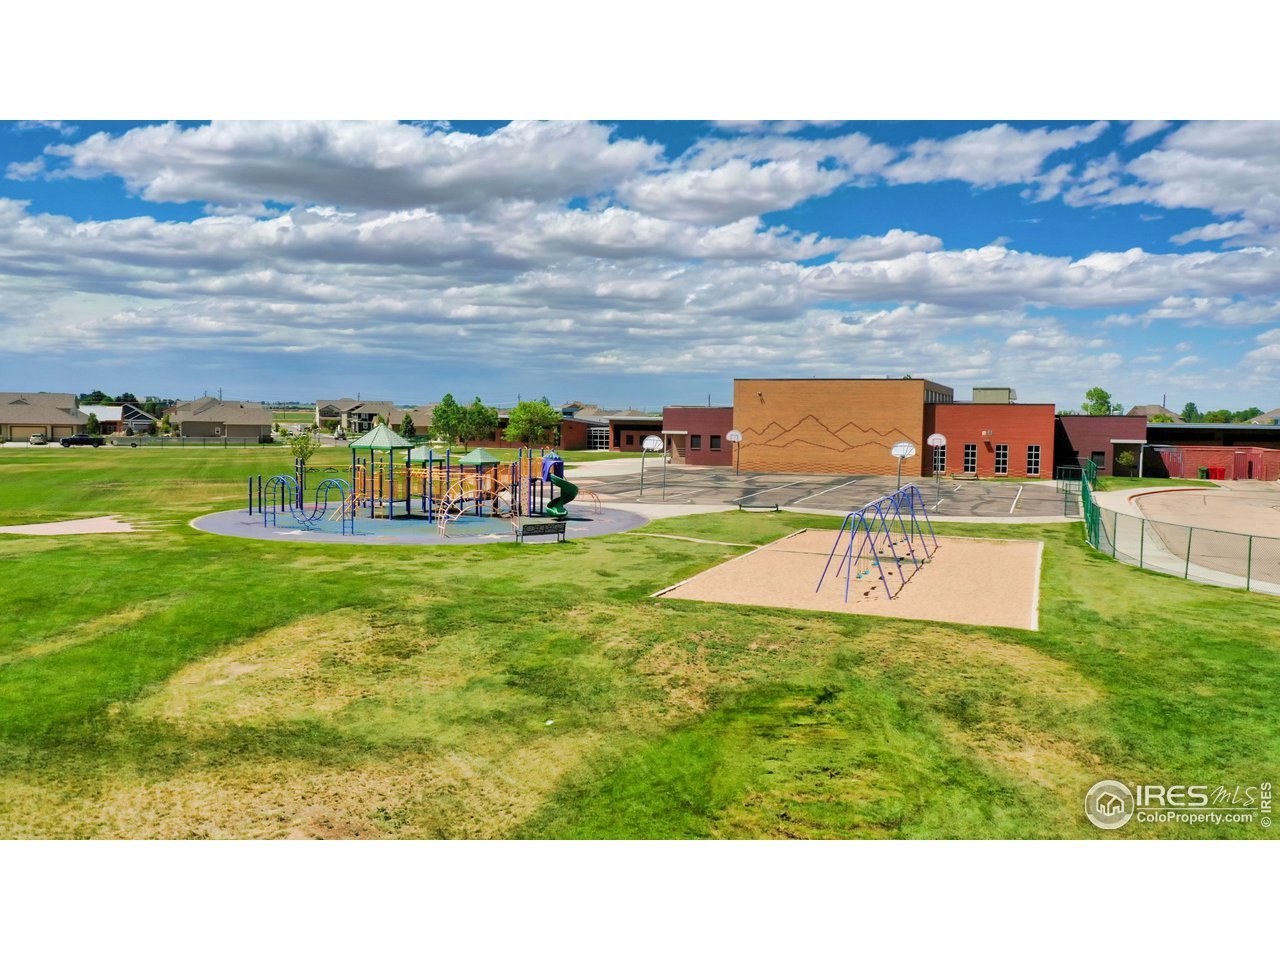 Schools within walking distance